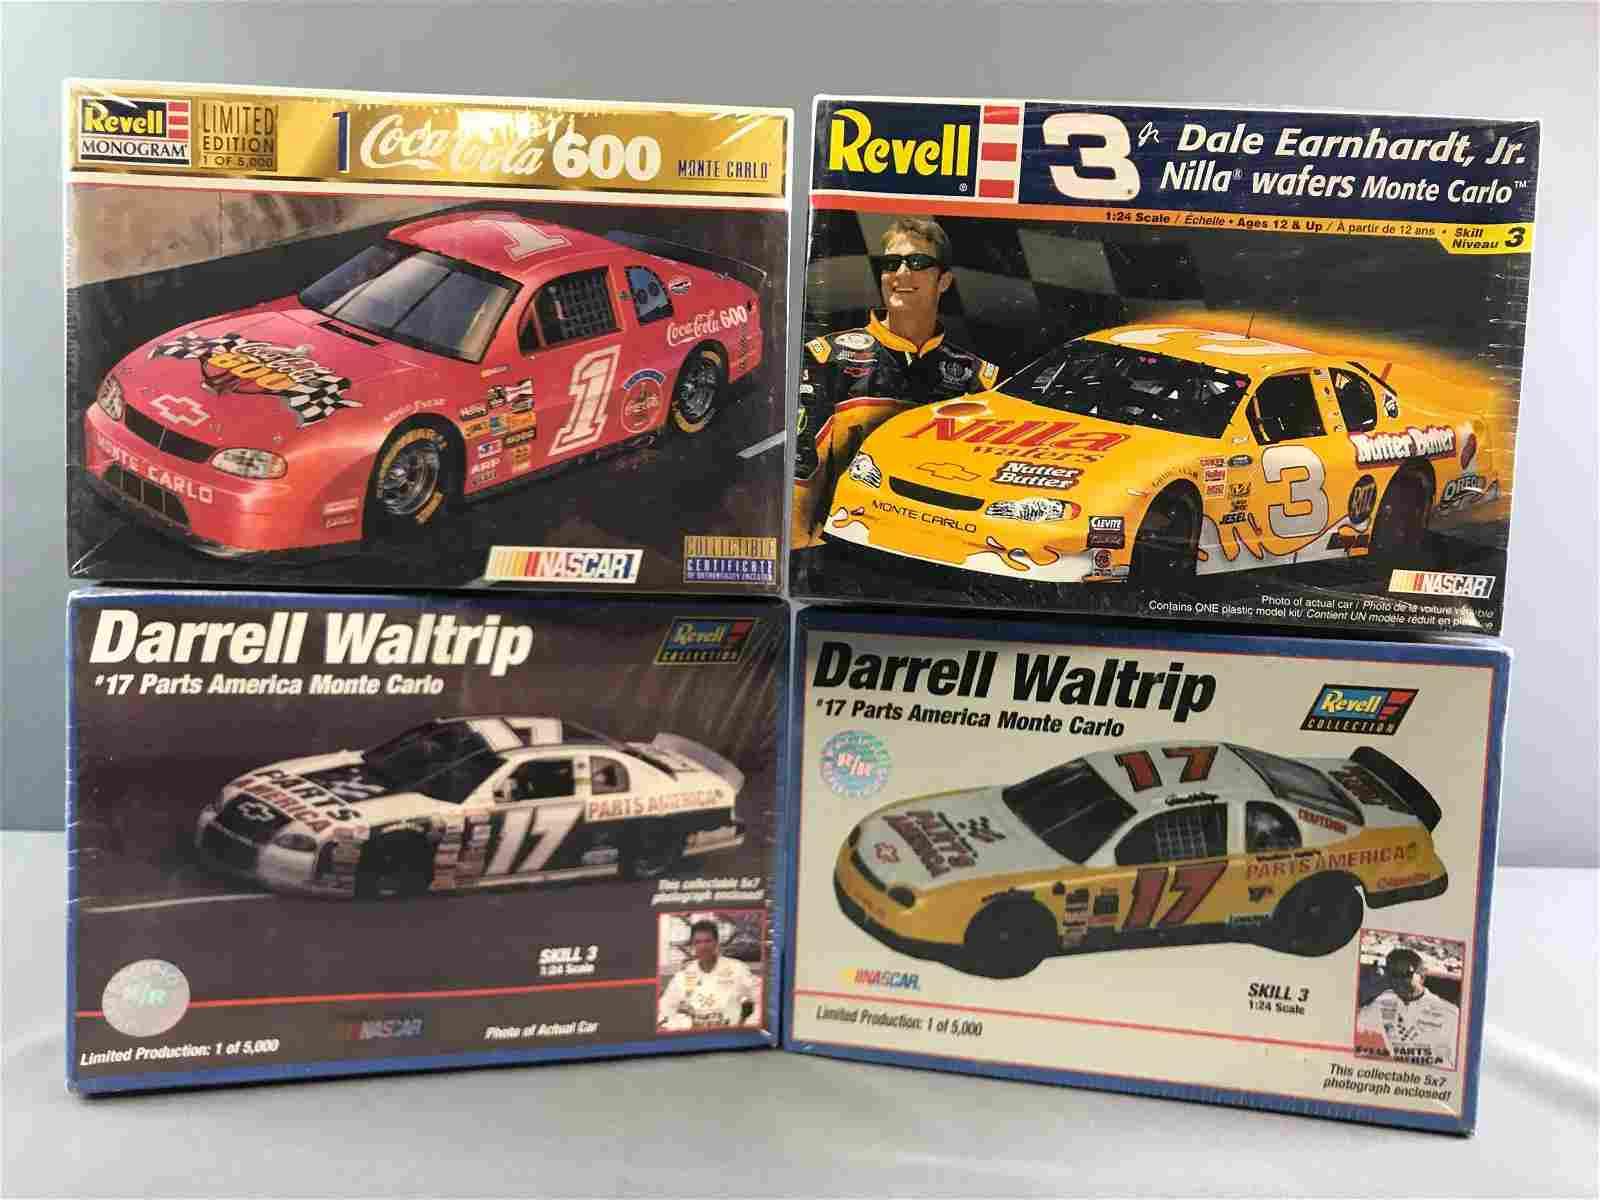 Group of 4 NASCAR Scale Model Car Kits in Original